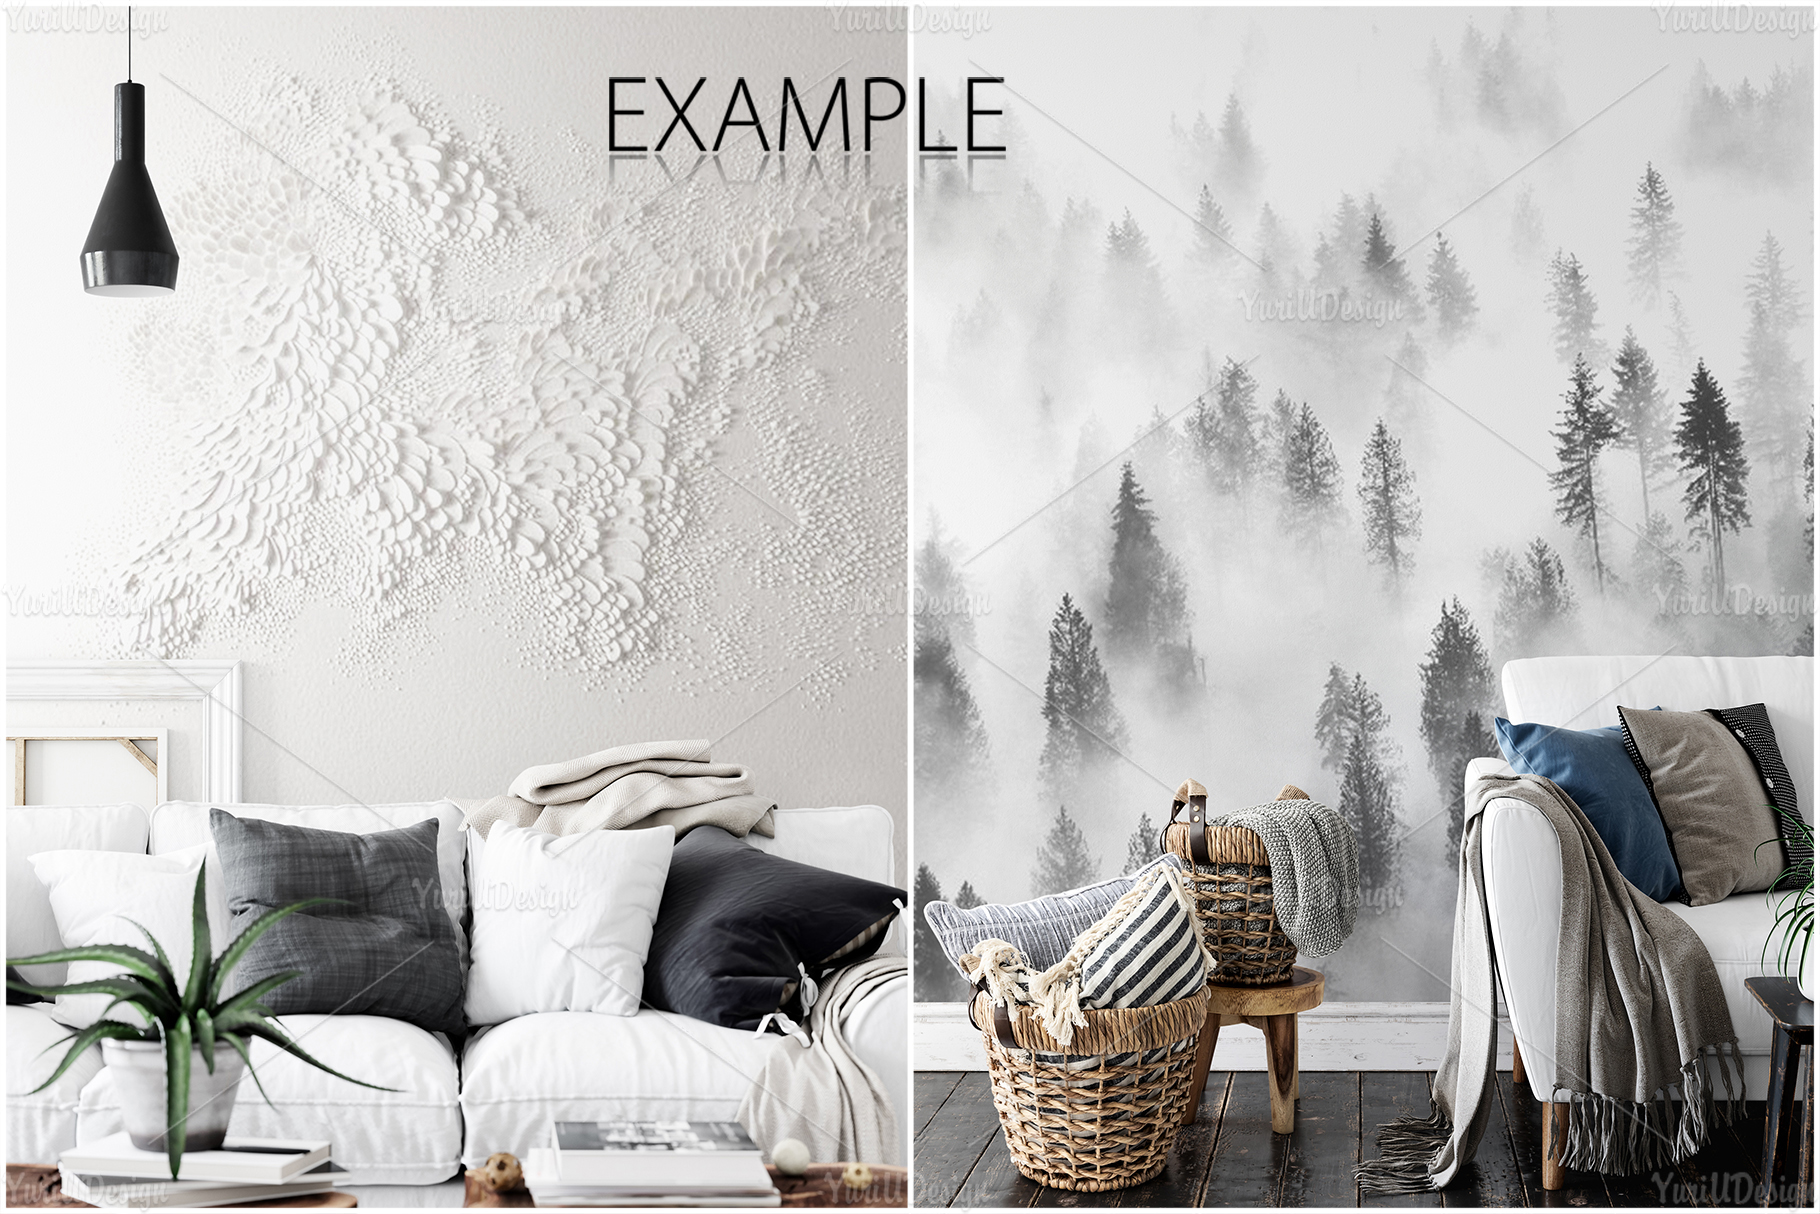 Scandinavian Interior Frames & Walls Mockup Bundle - 3 example image 10